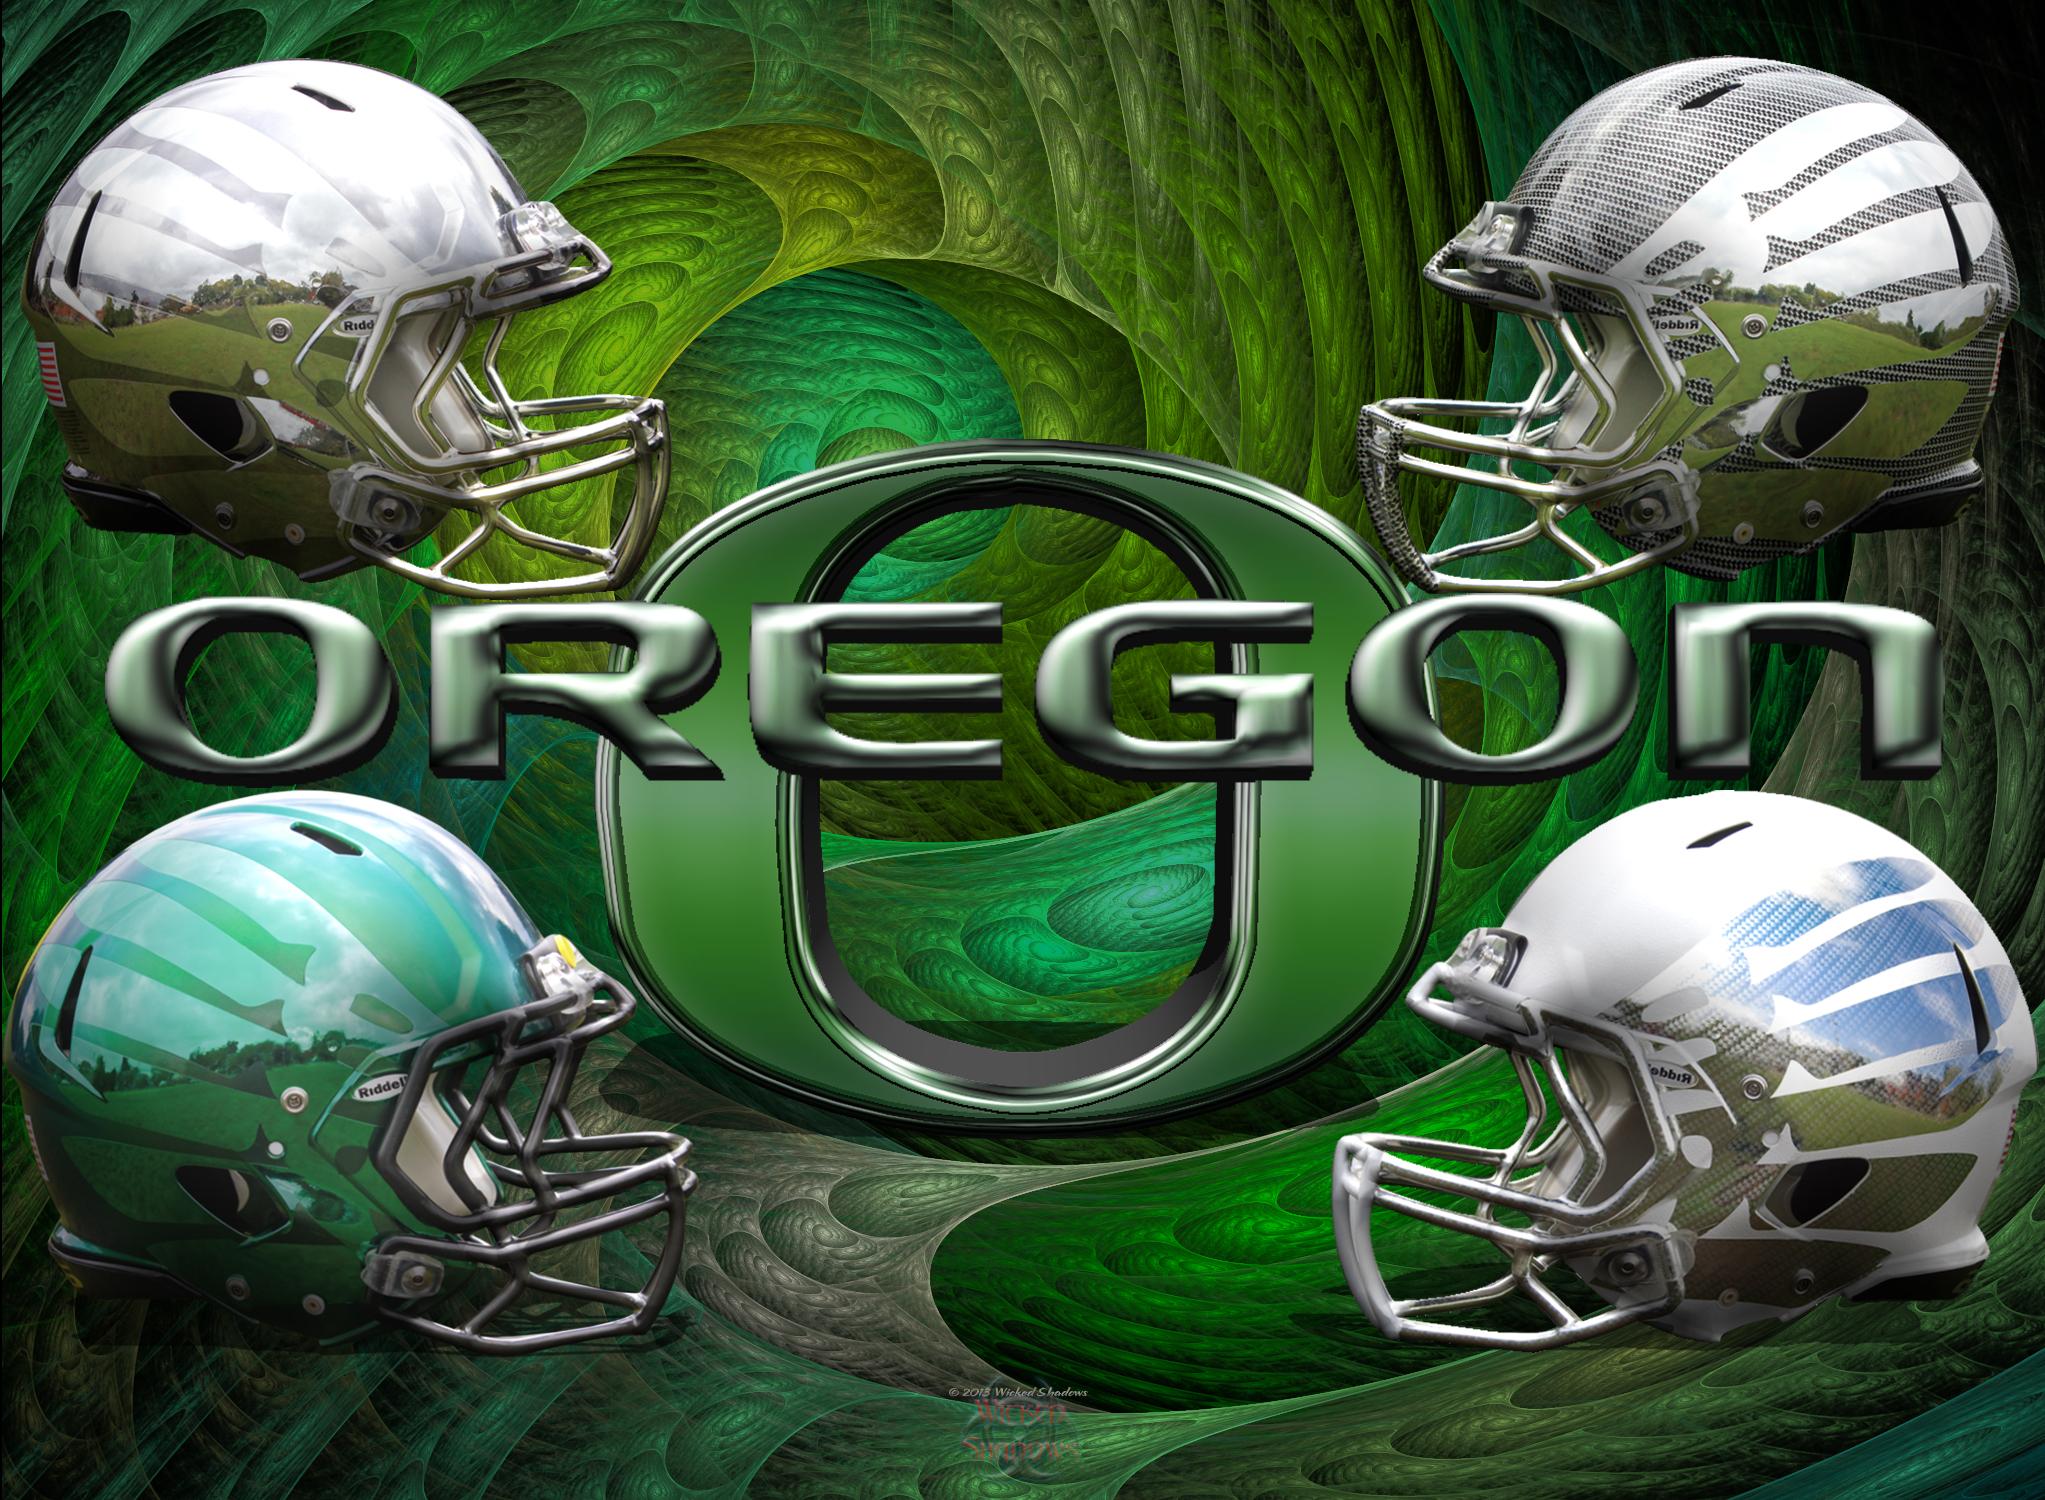 Oregon Ducks Wallpapers Pictures 2045x1500